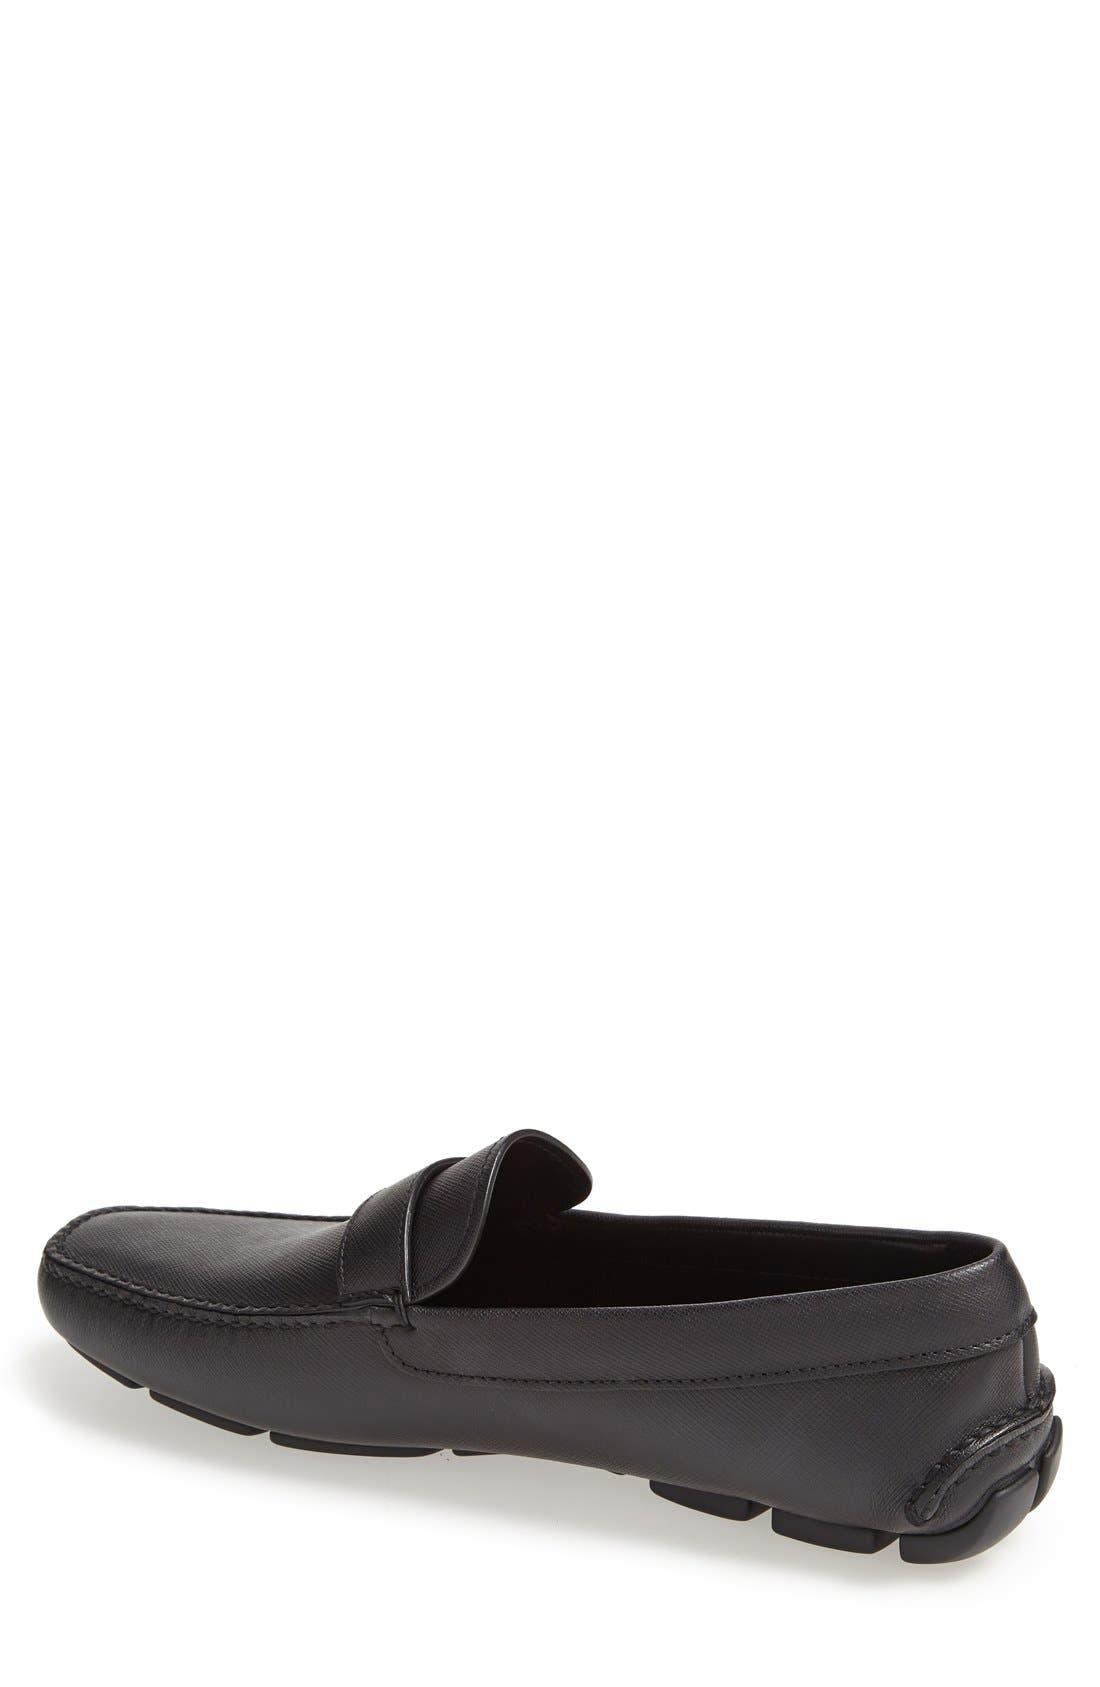 Alternate Image 2  - Prada Saffiano Leather Driving Shoe (Men)